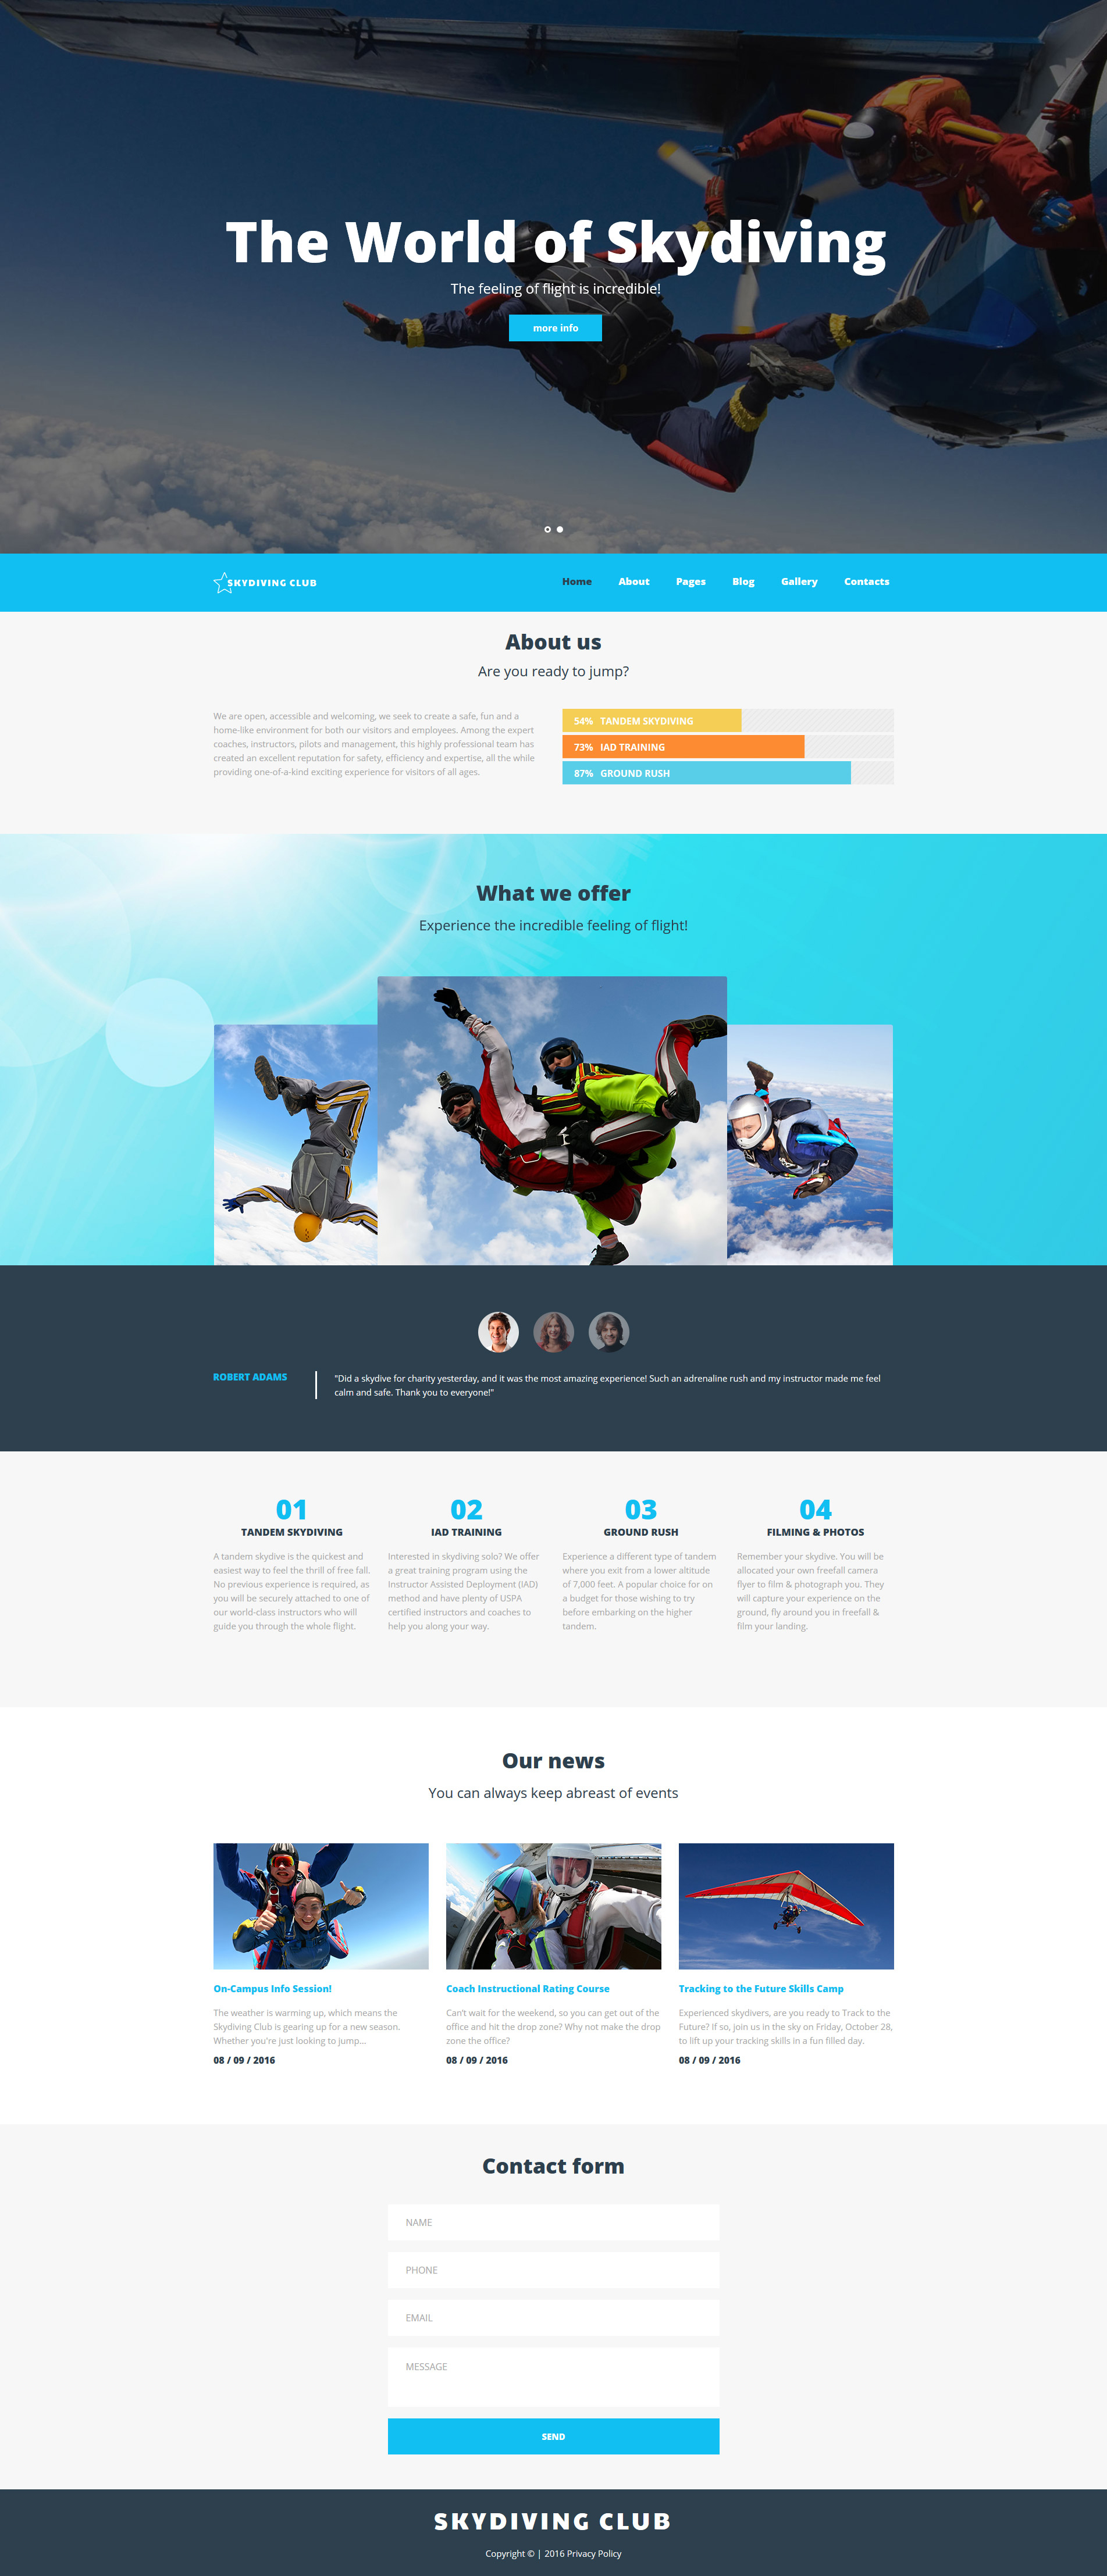 Skydiving Club - Extreme Sports & Skydiving Club Joomla Template